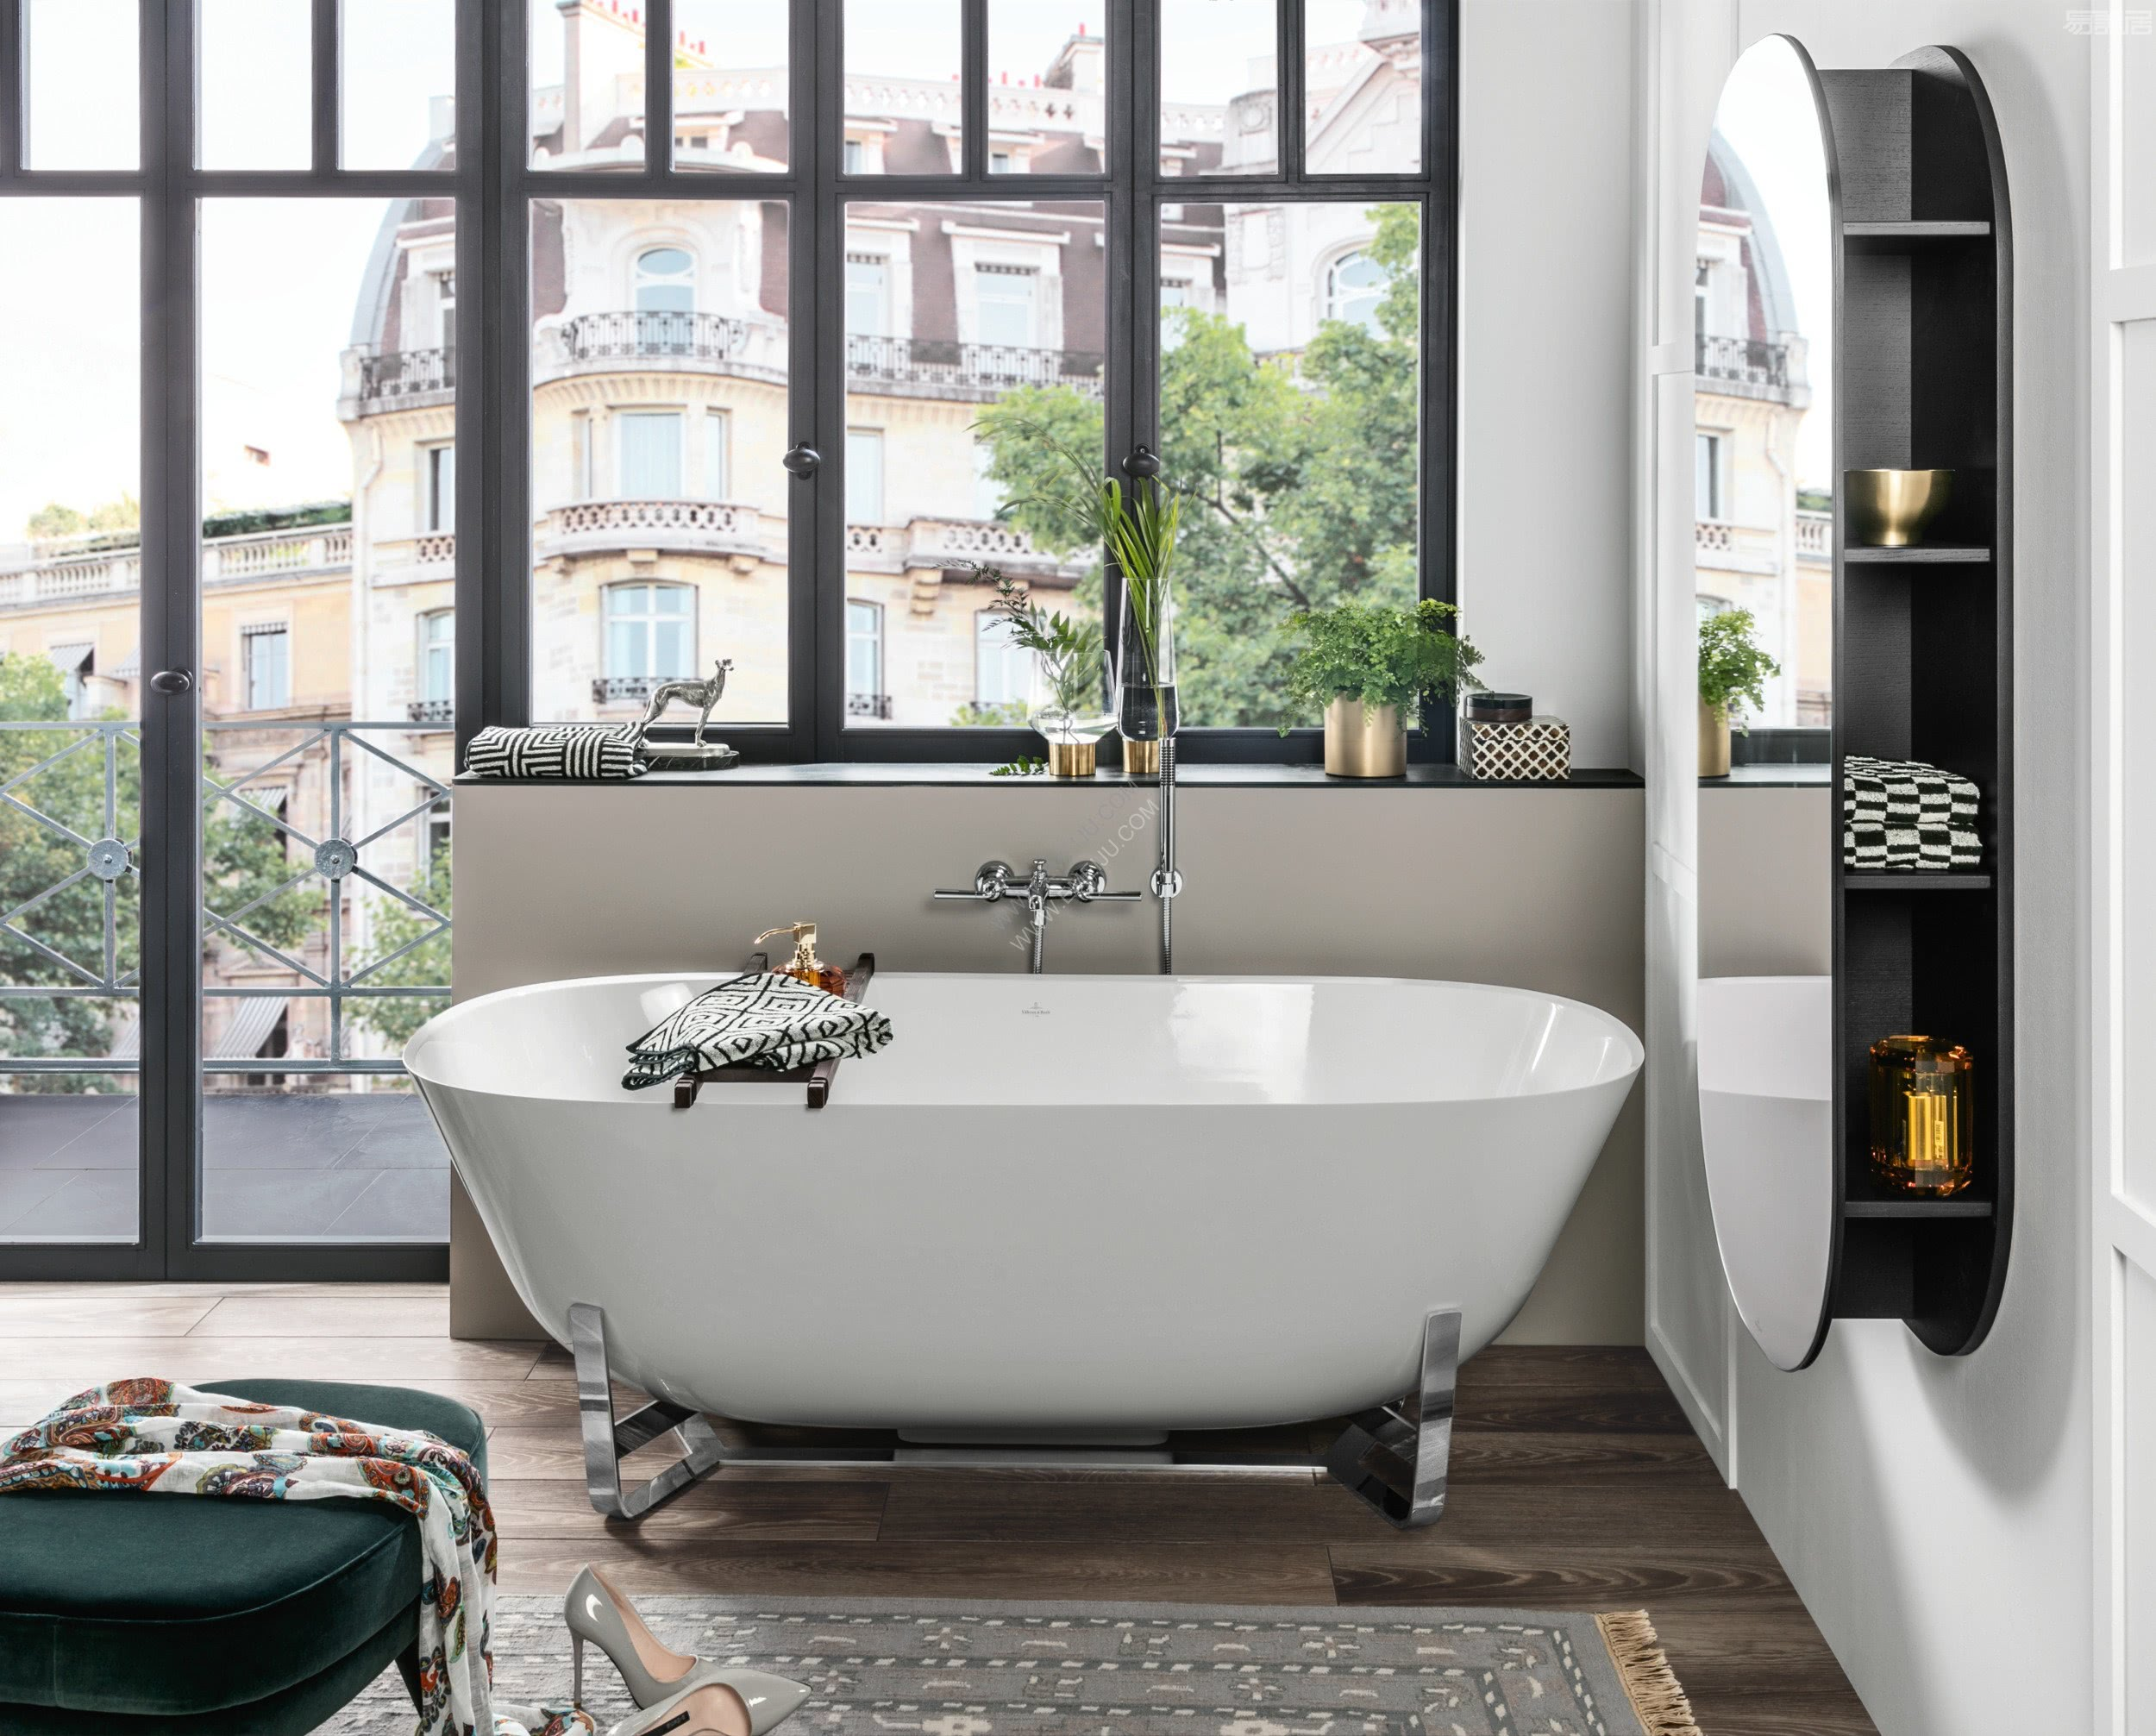 ANTHEUS-Quaryl-bathtub-Villeroy-Boch-332255-rel84d71f30.jpg